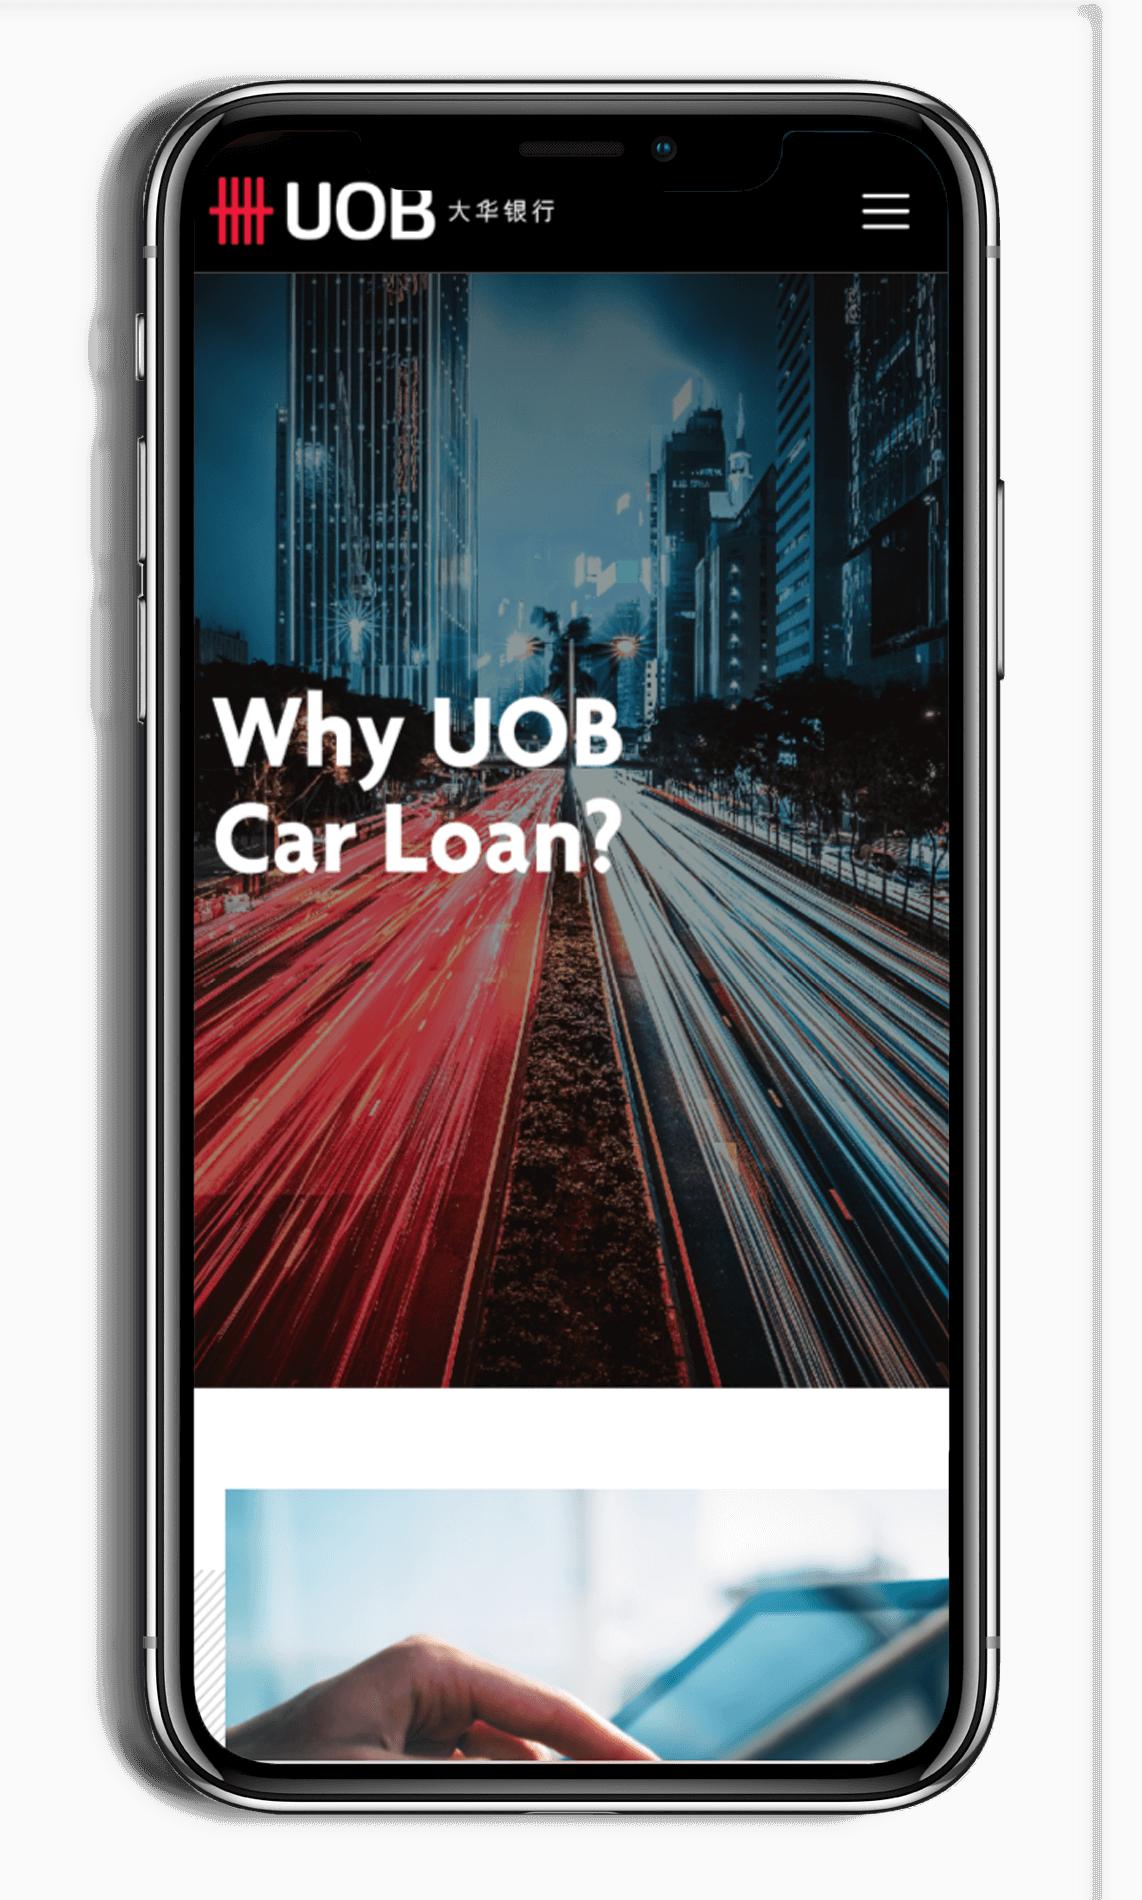 UOB car loan microsite on smart phone - why UOB car loan